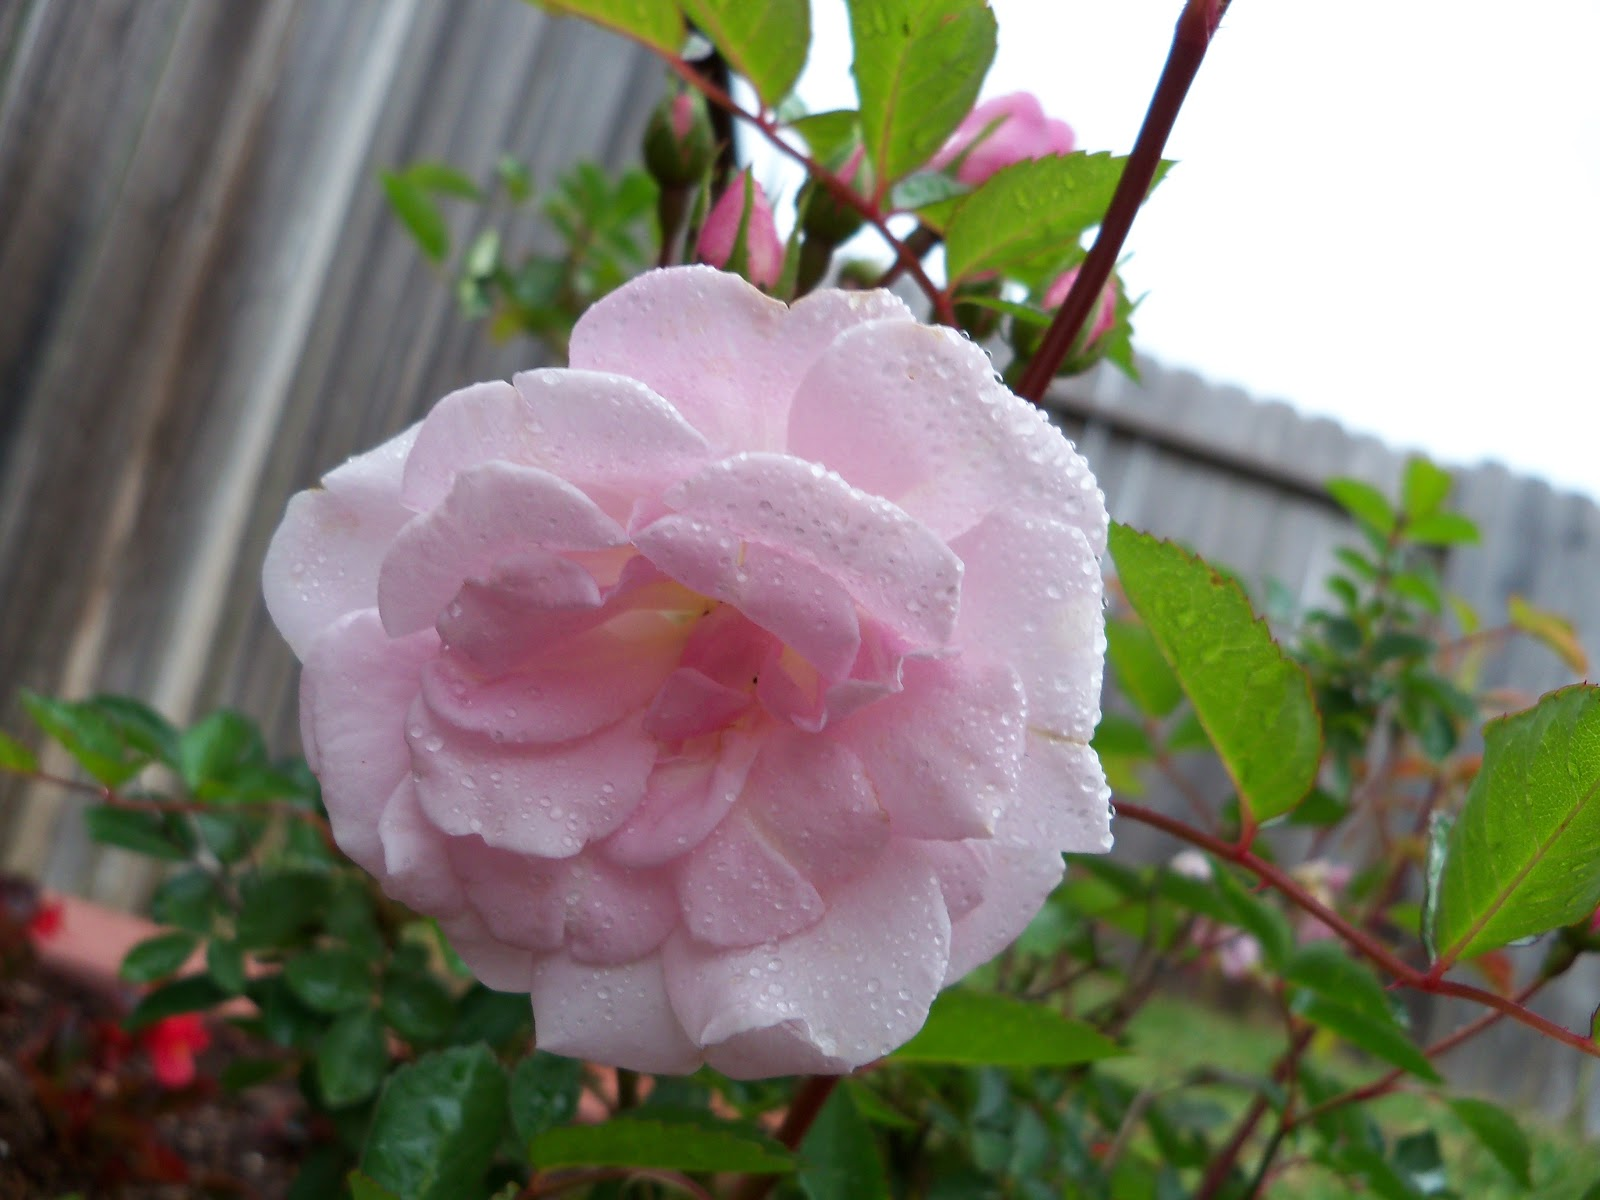 Gardening 2010 - 101_0537.JPG